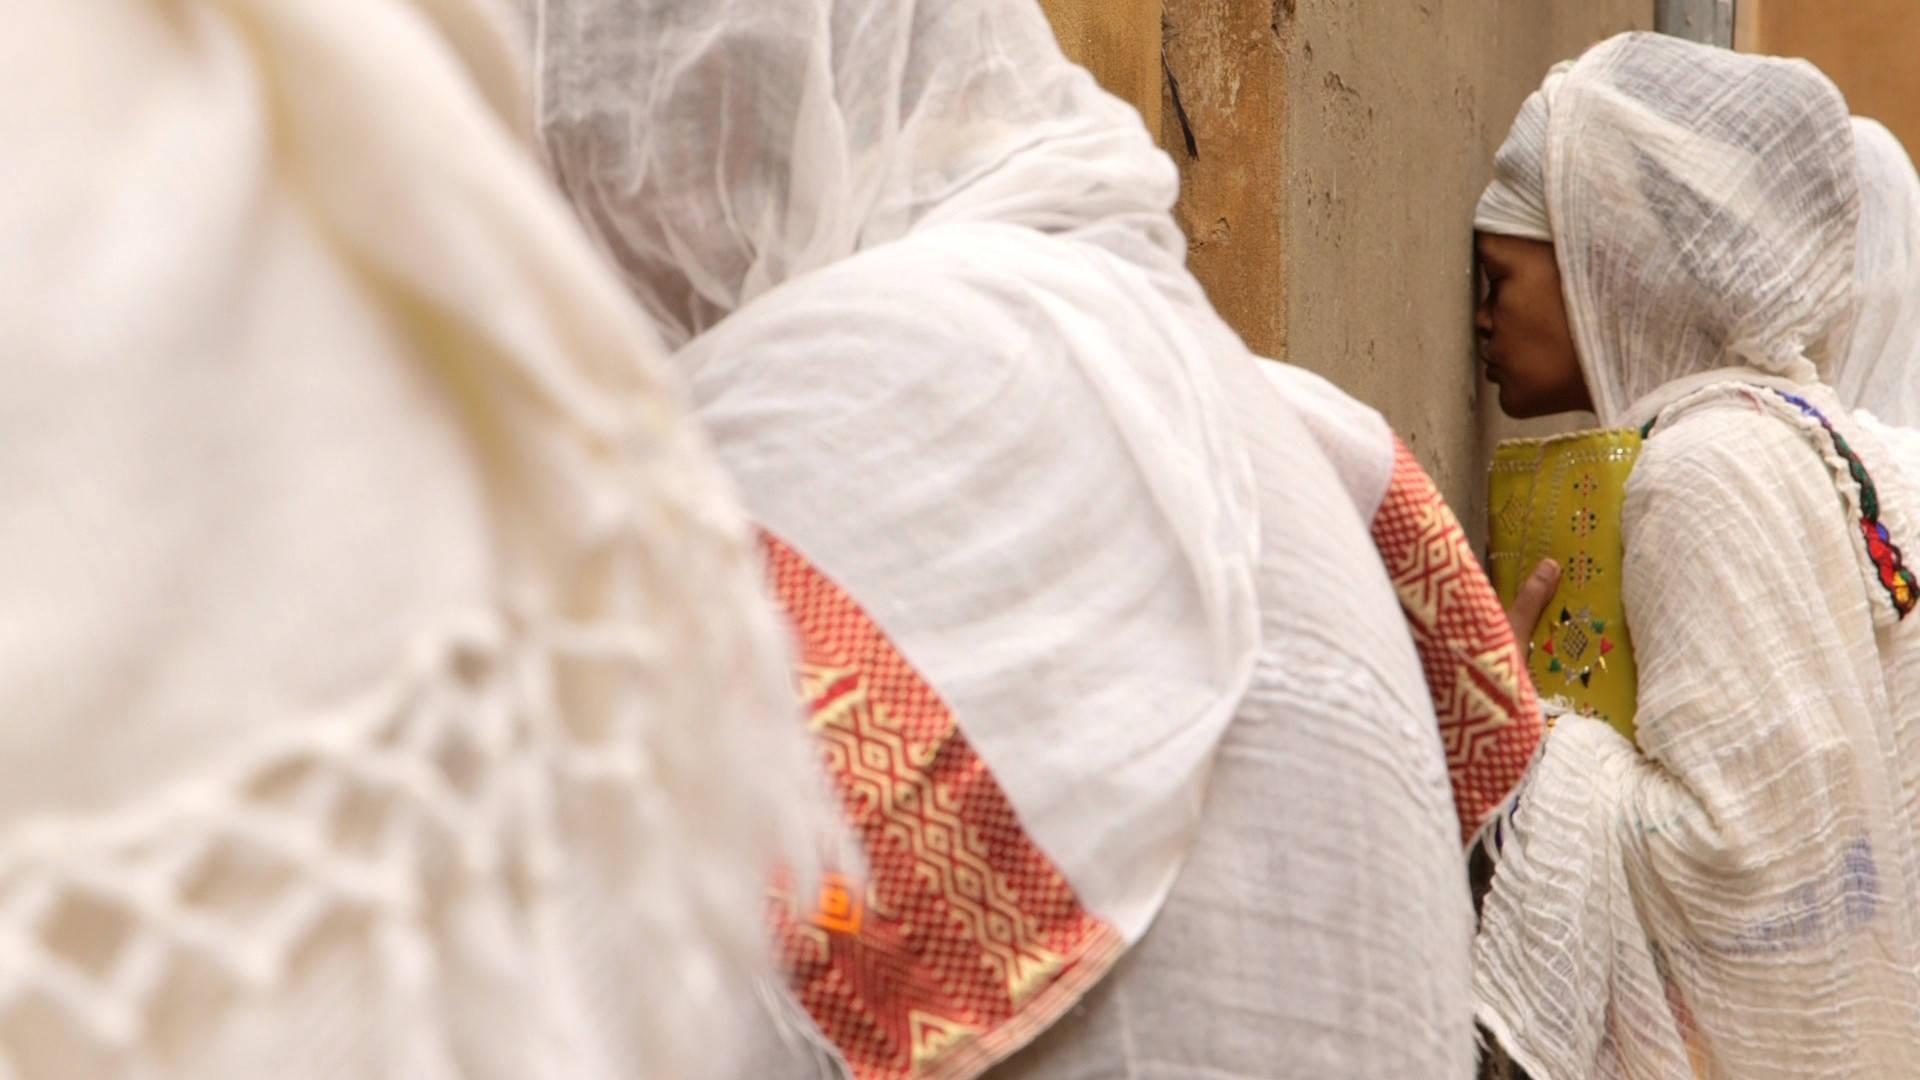 Viaggio Intorno al Mondo - Eritree